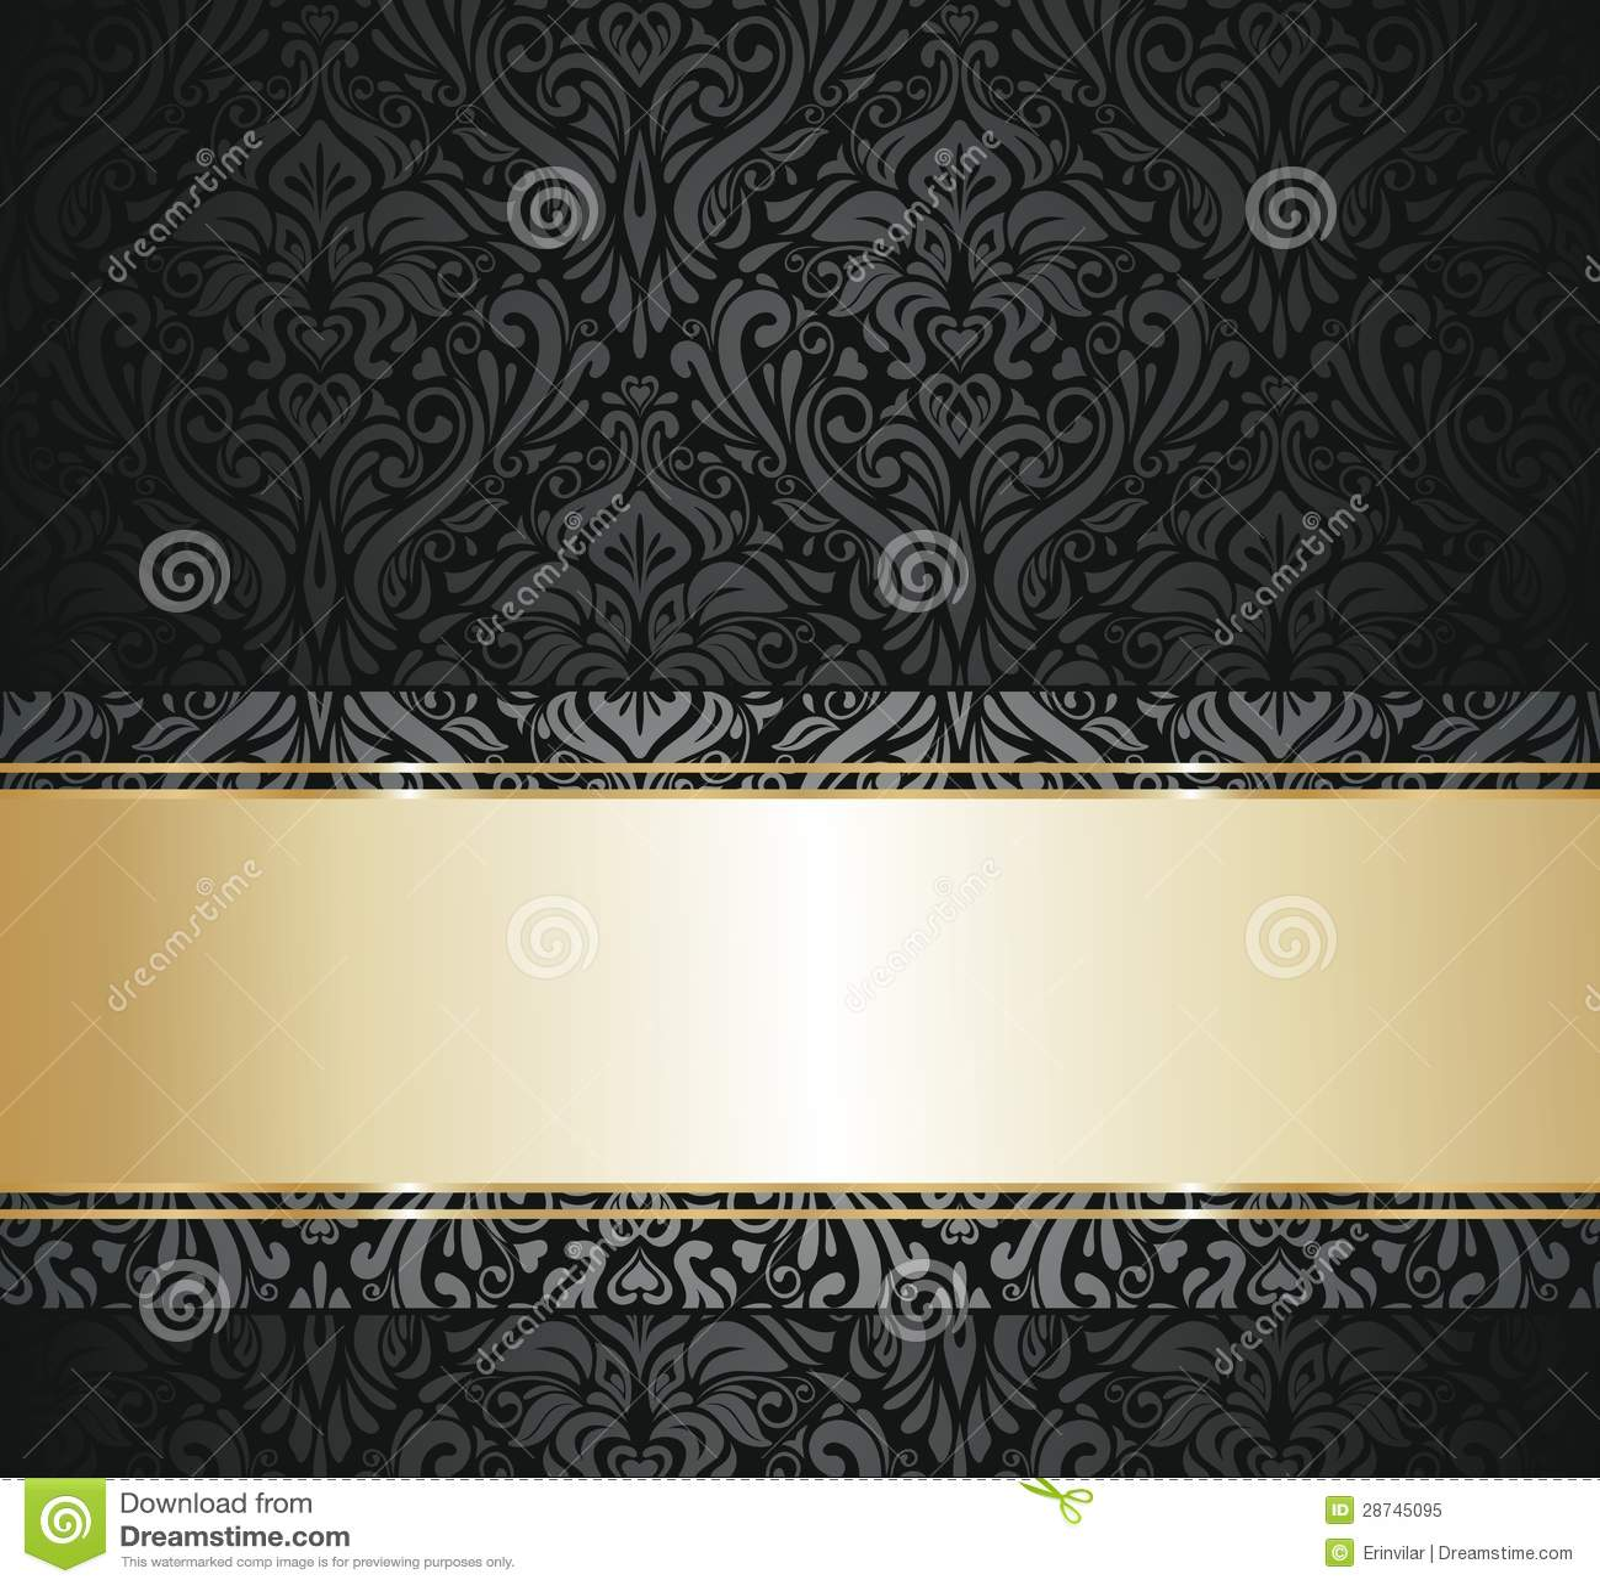 Black And Gold Vintage Wallpaper Stock Vector Illustration Of